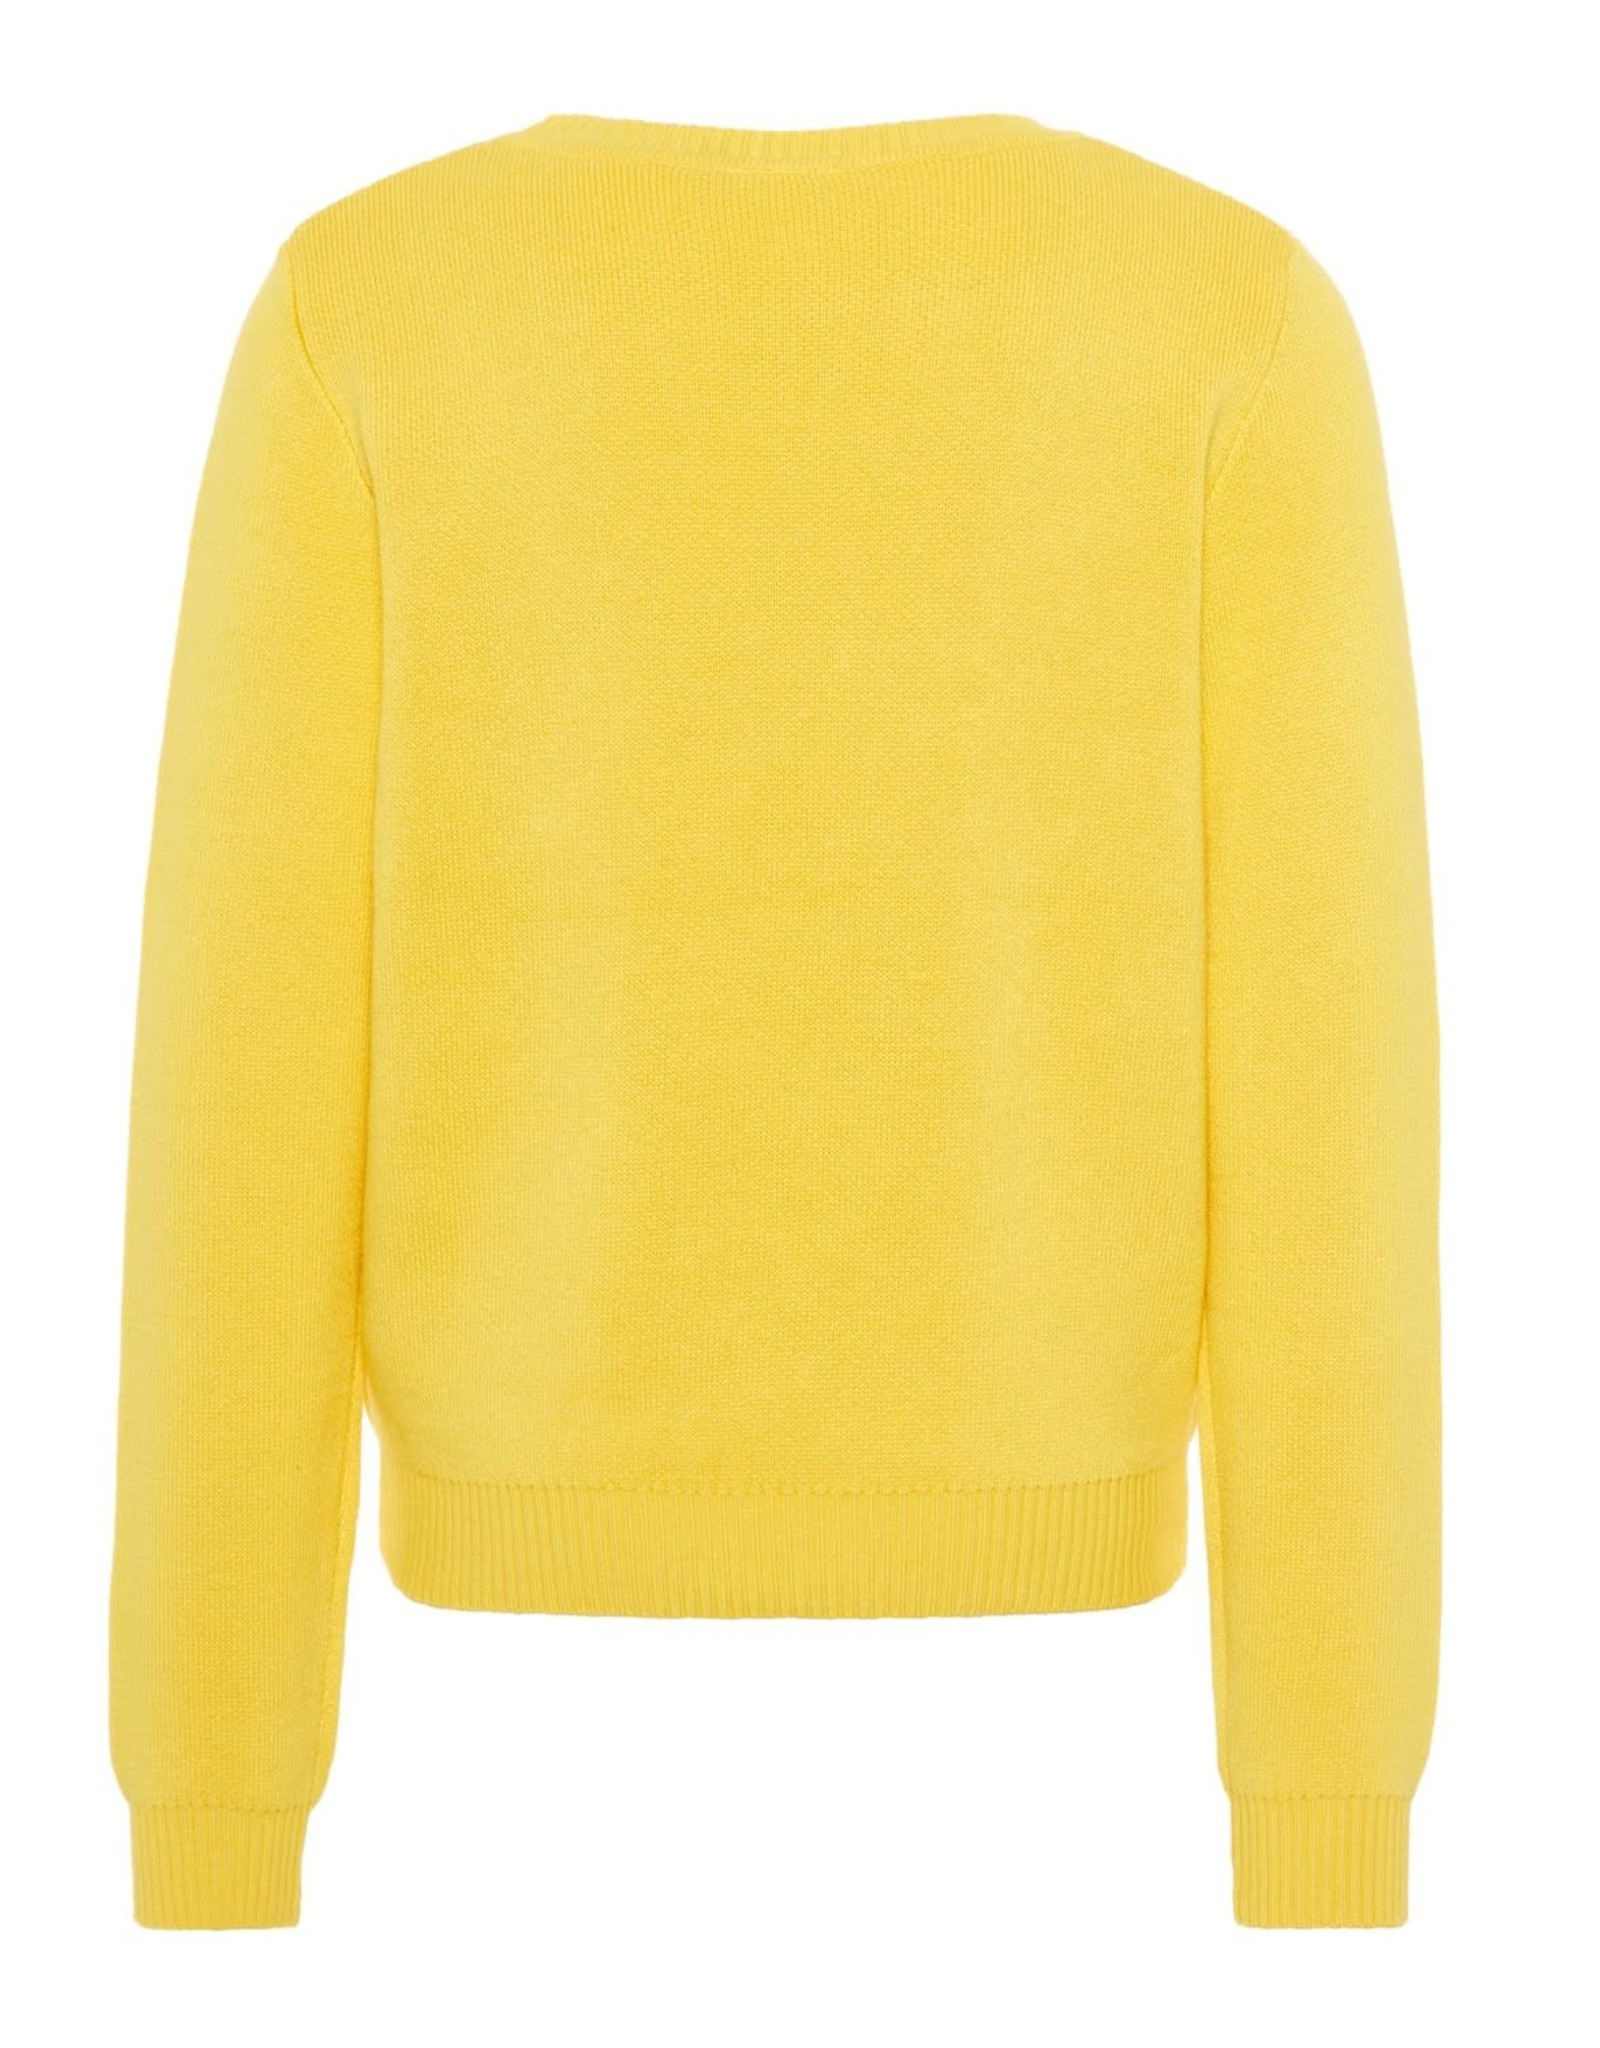 Name It Sweater dominca